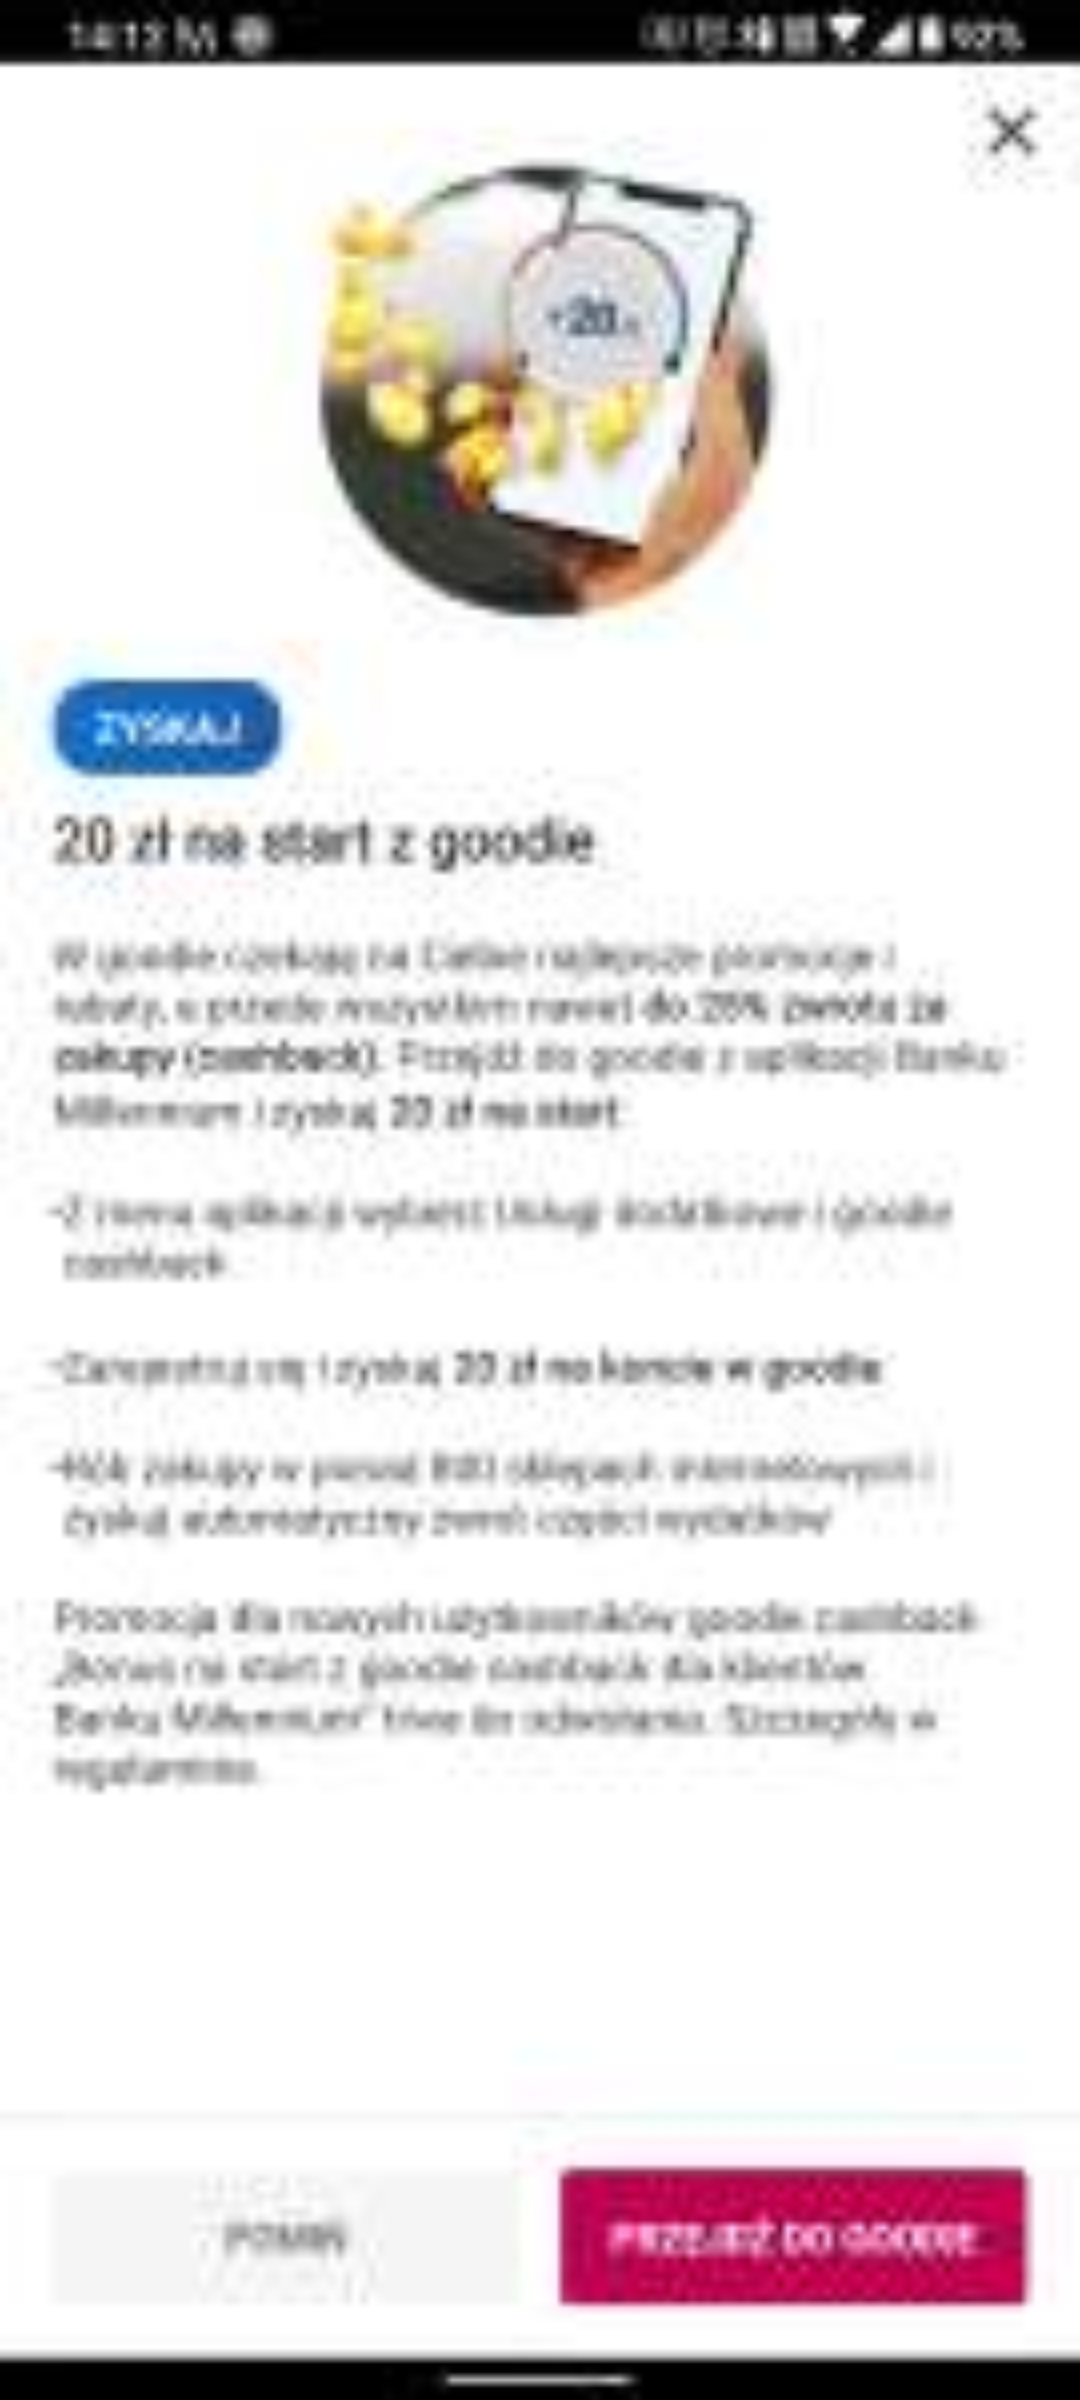 20 zł za friko goodie millenium bank